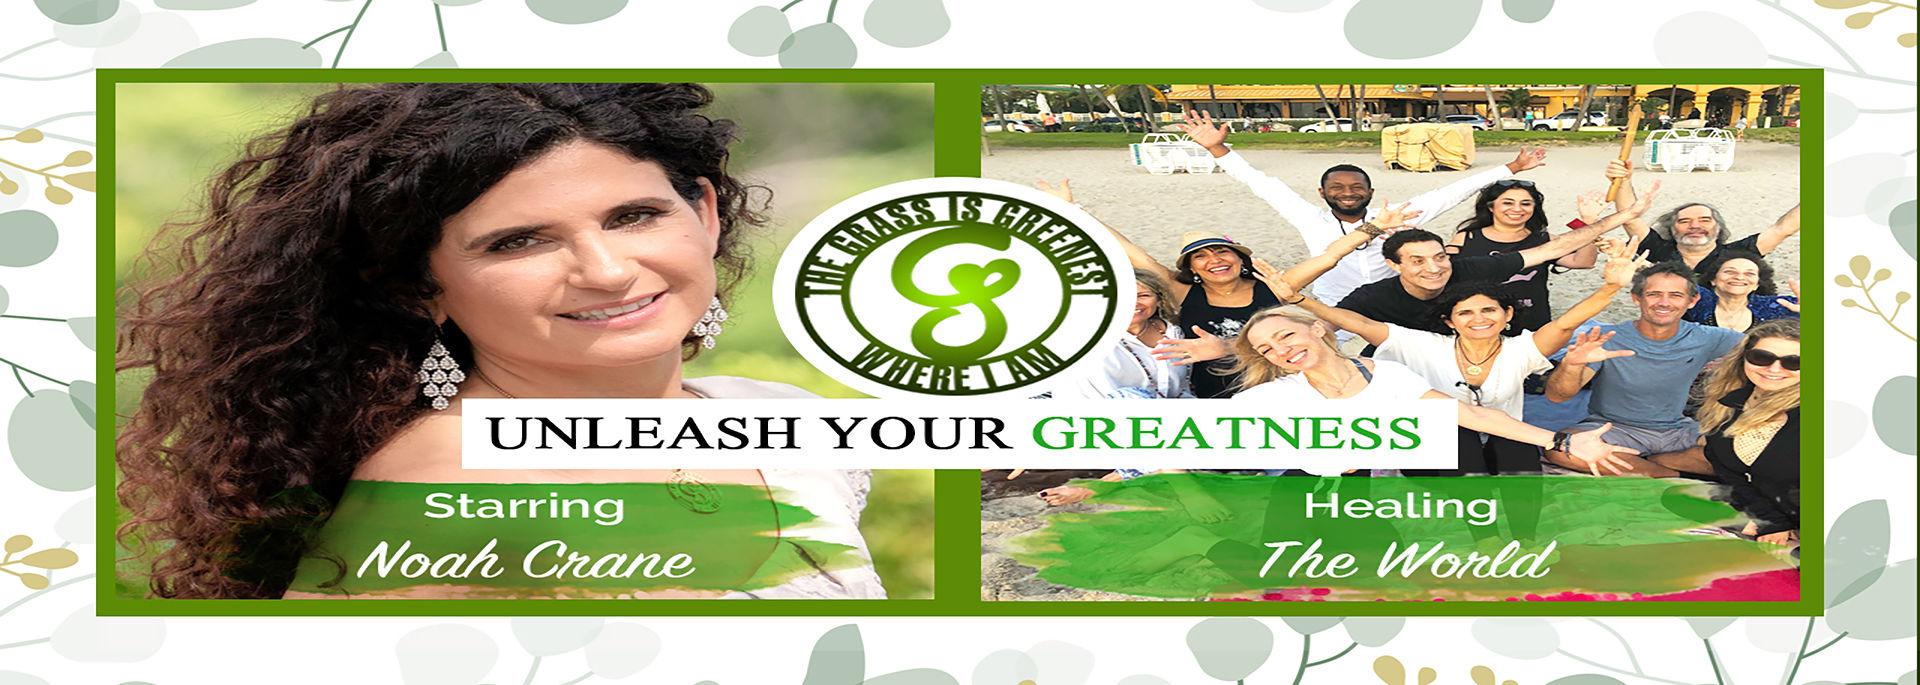 UNLEASH YOUR GREATNESS